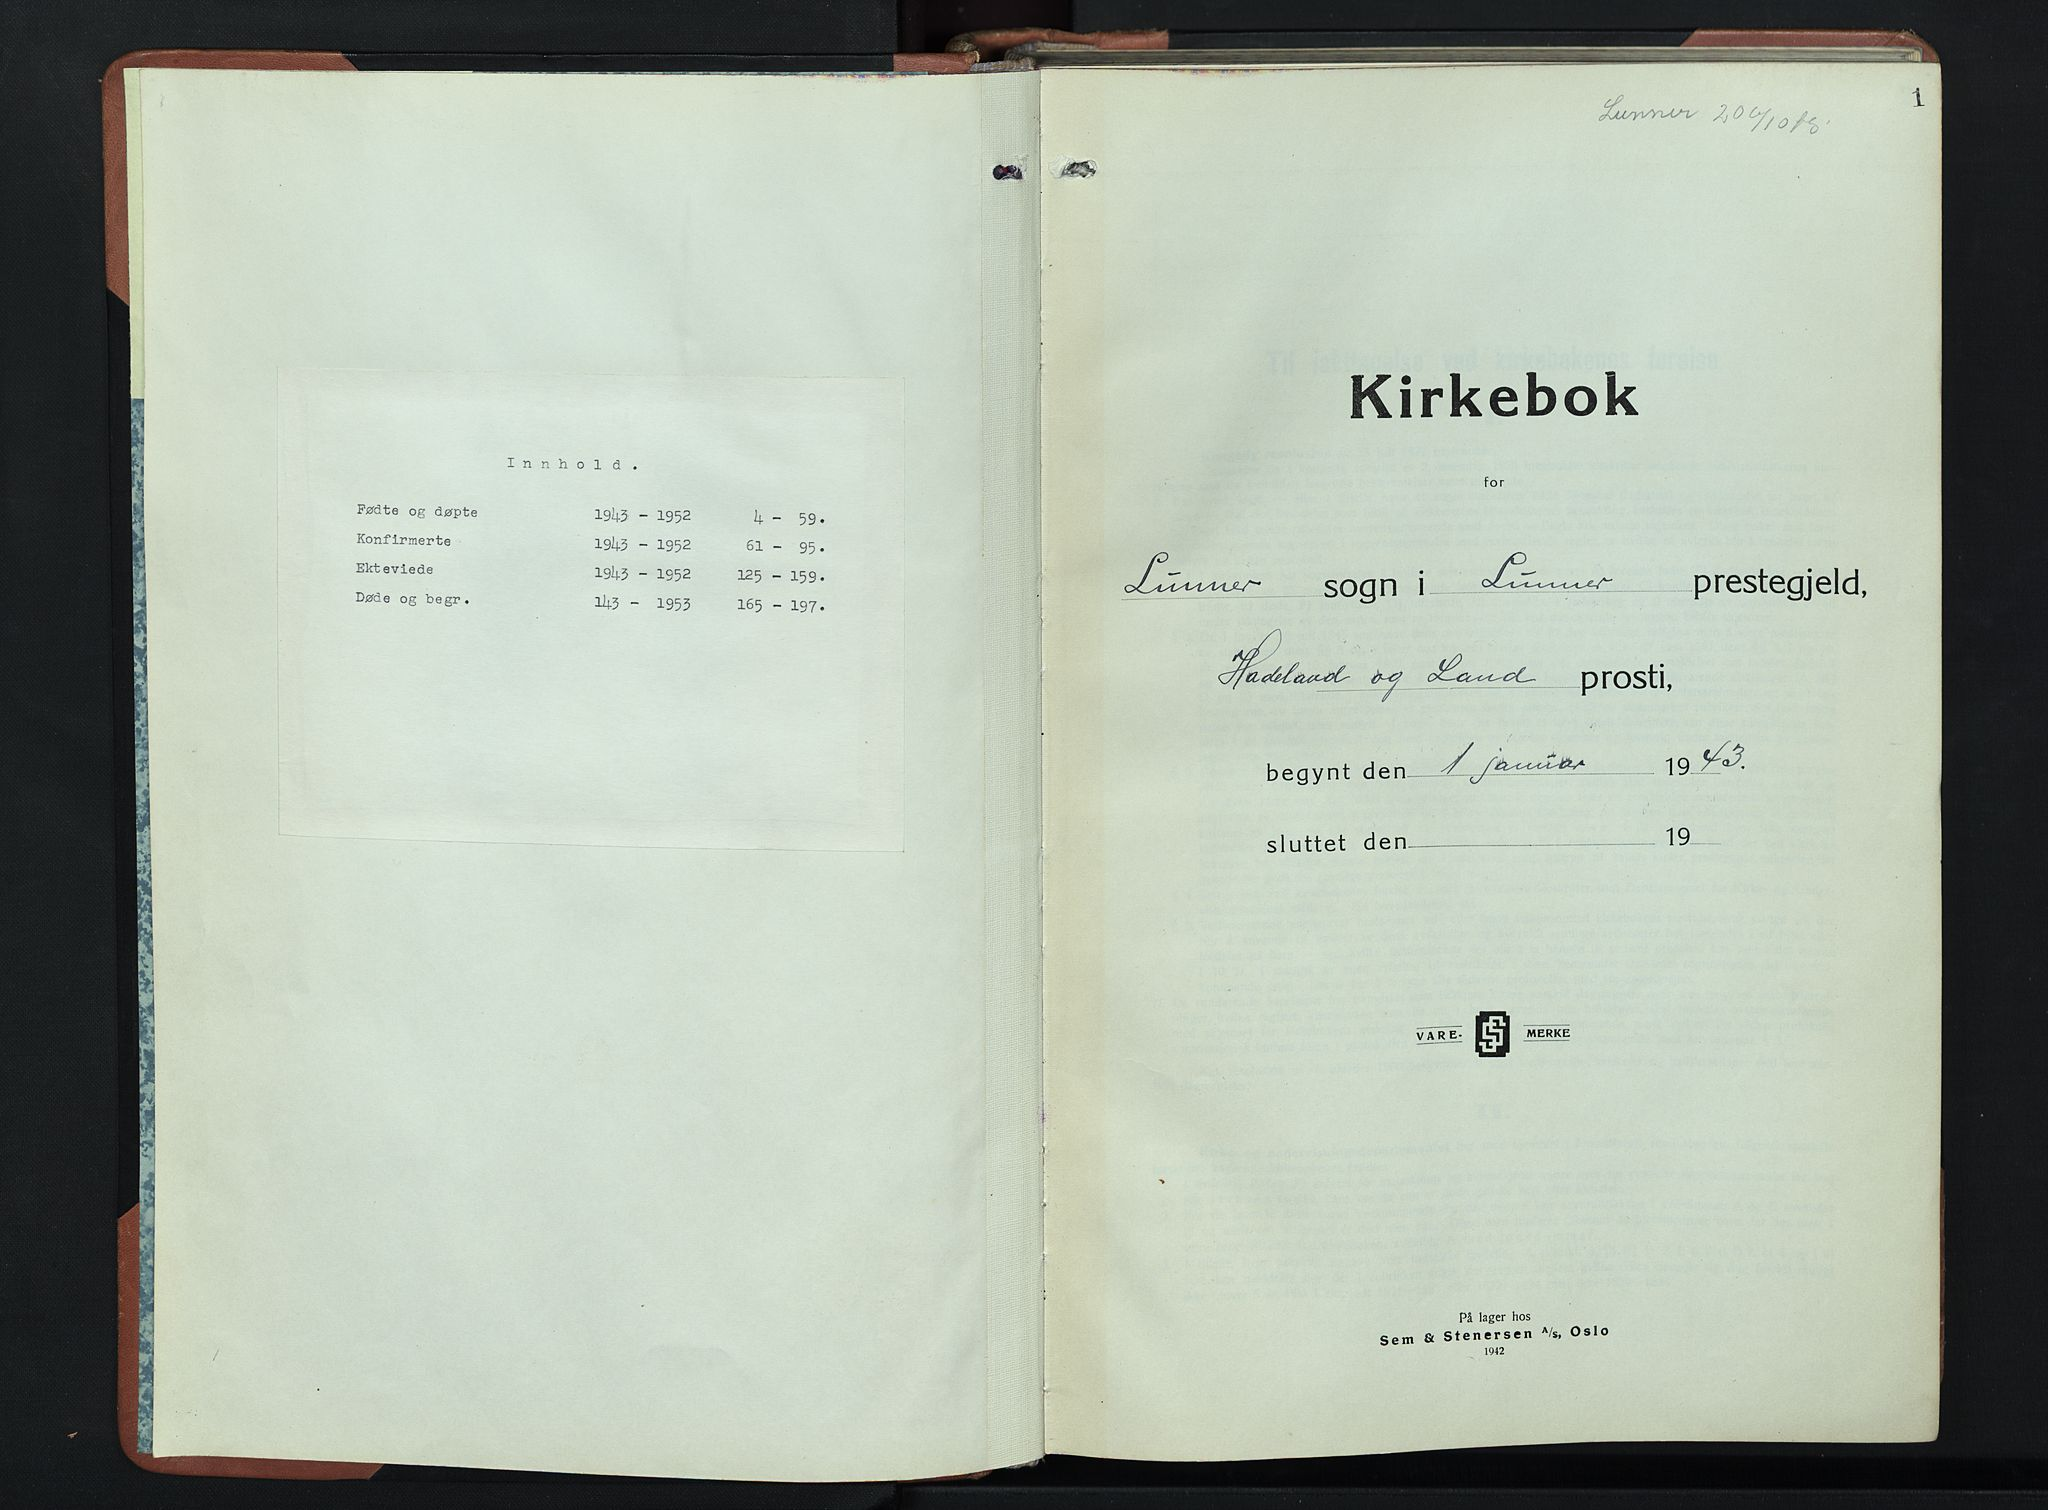 SAH, Lunner prestekontor, H/Ha/Hab/L0004: Klokkerbok nr. 4, 1943-1952, s. 1